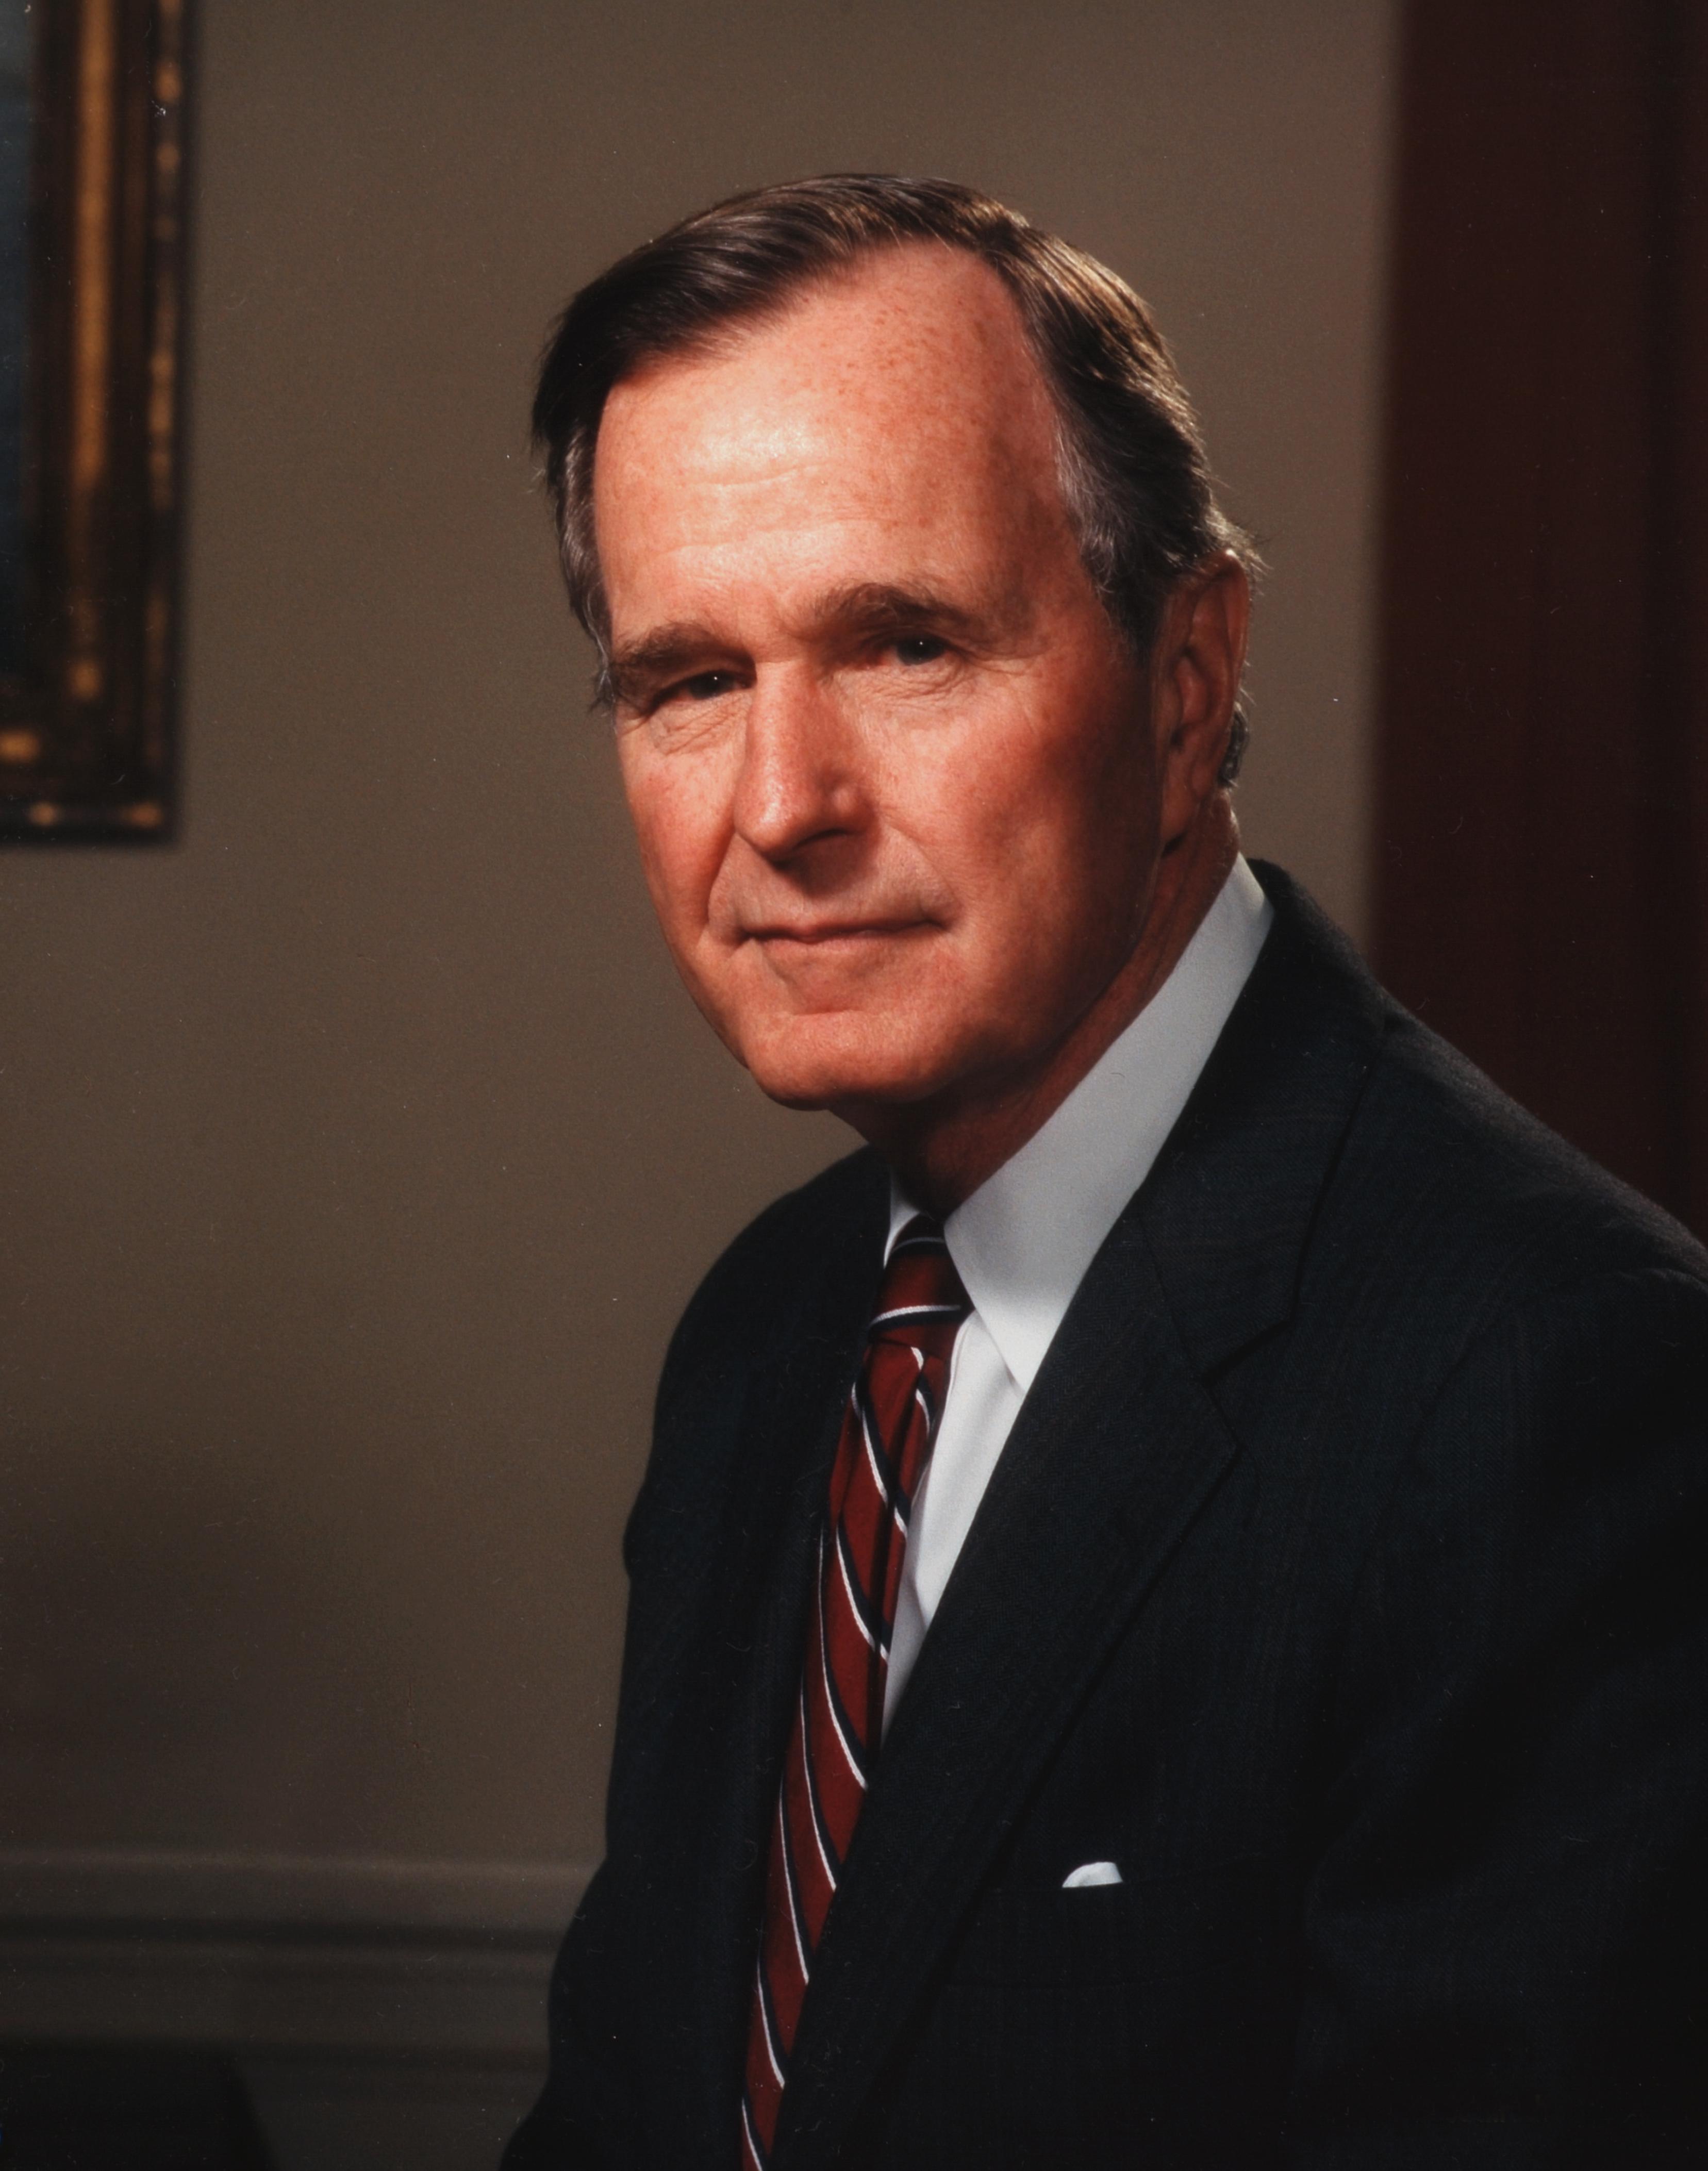 Portrait Of President George Herbert Walker Bush